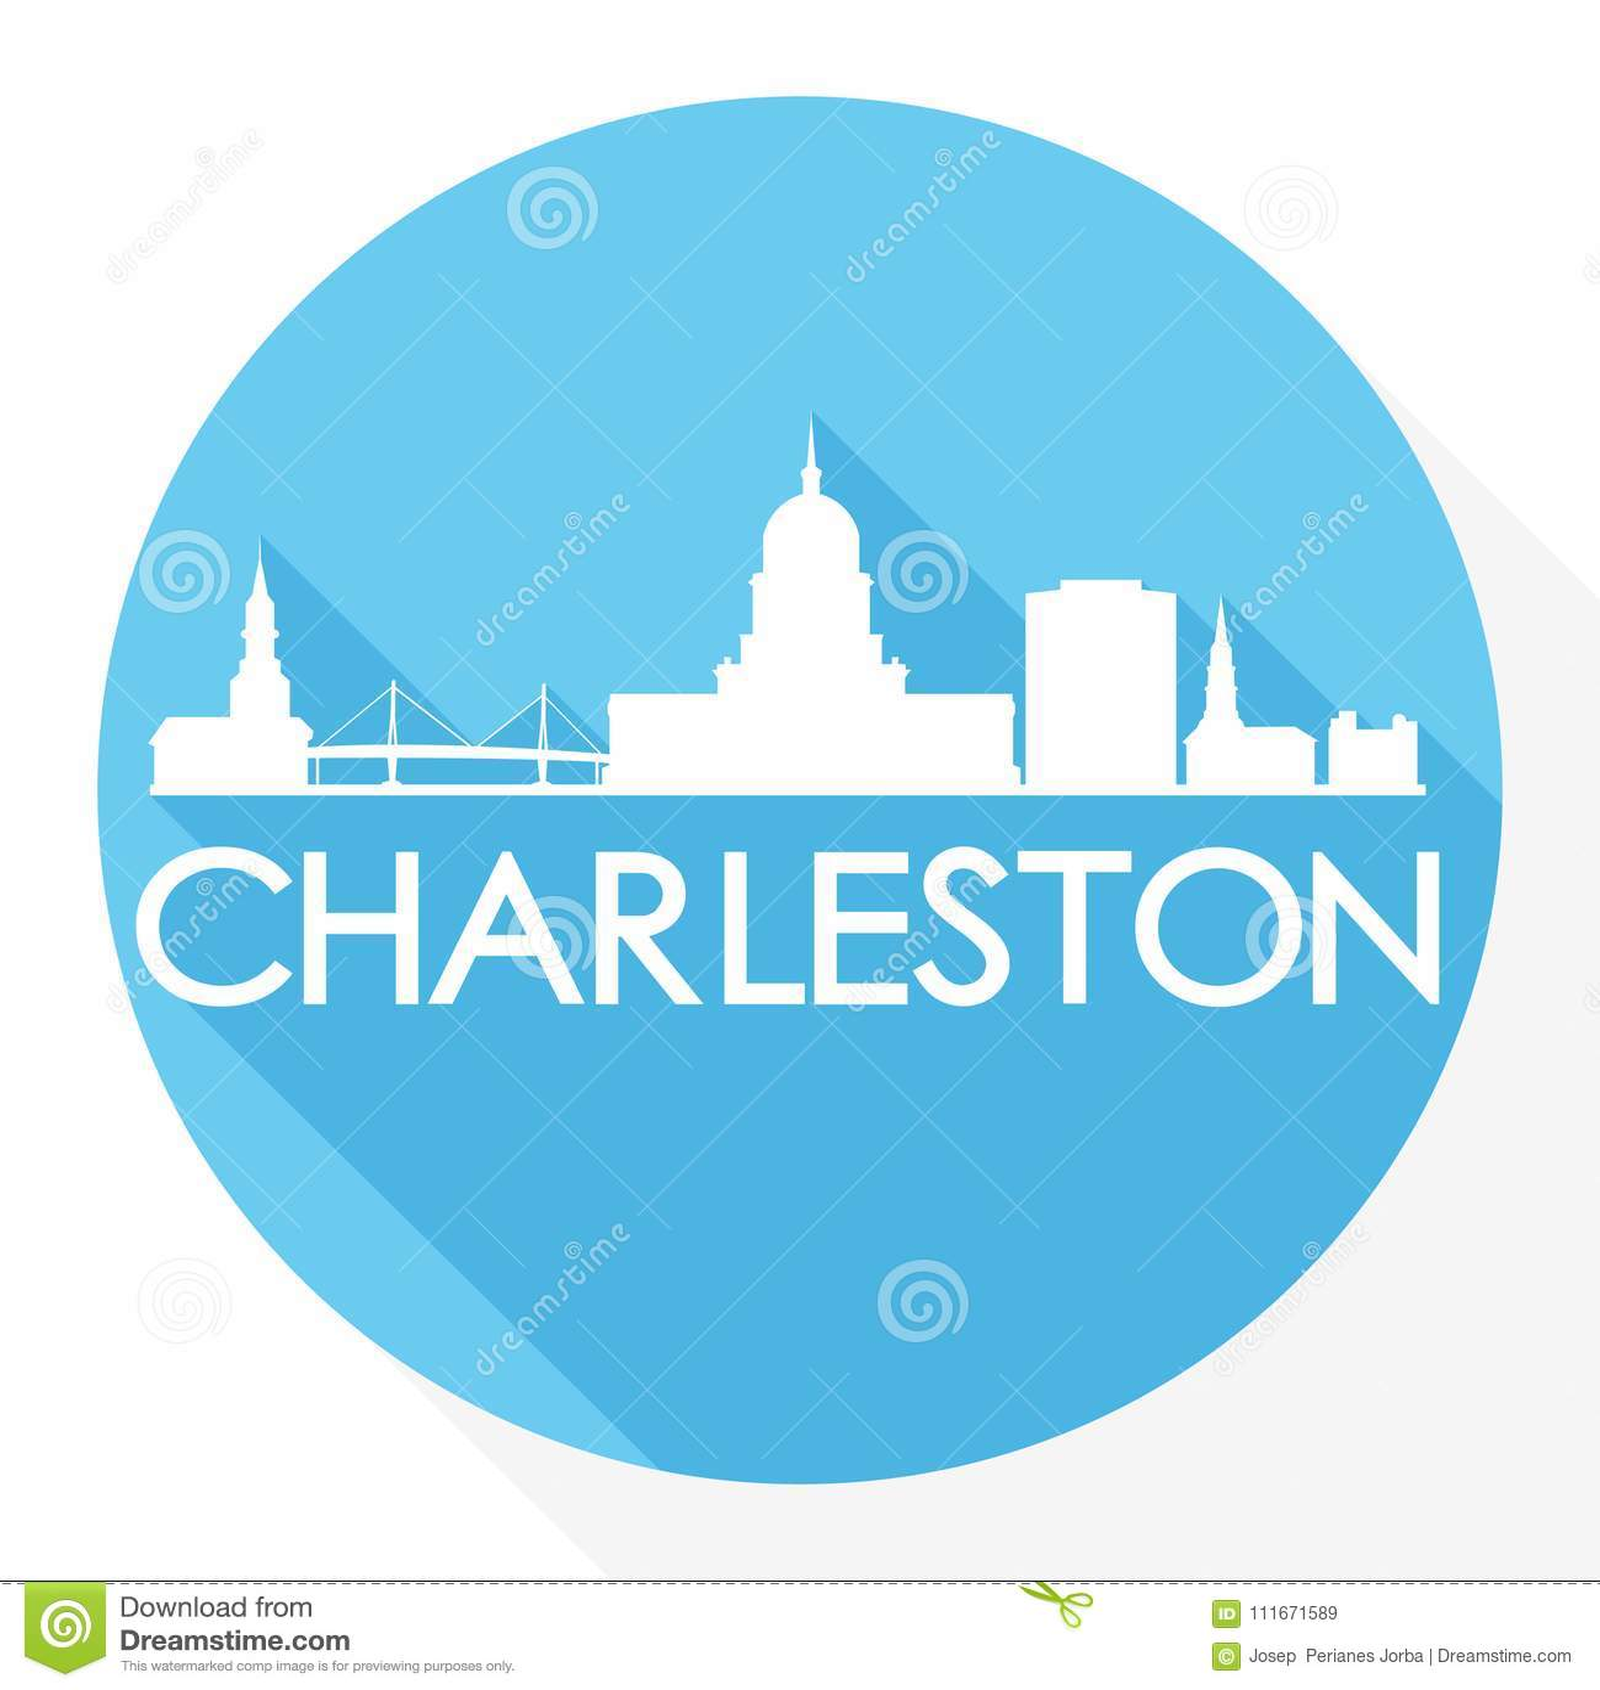 Logotipo do molde da silhueta da cidade de Art Flat Shadow Design Skyline do vetor de Charleston South Carolina Round Icon